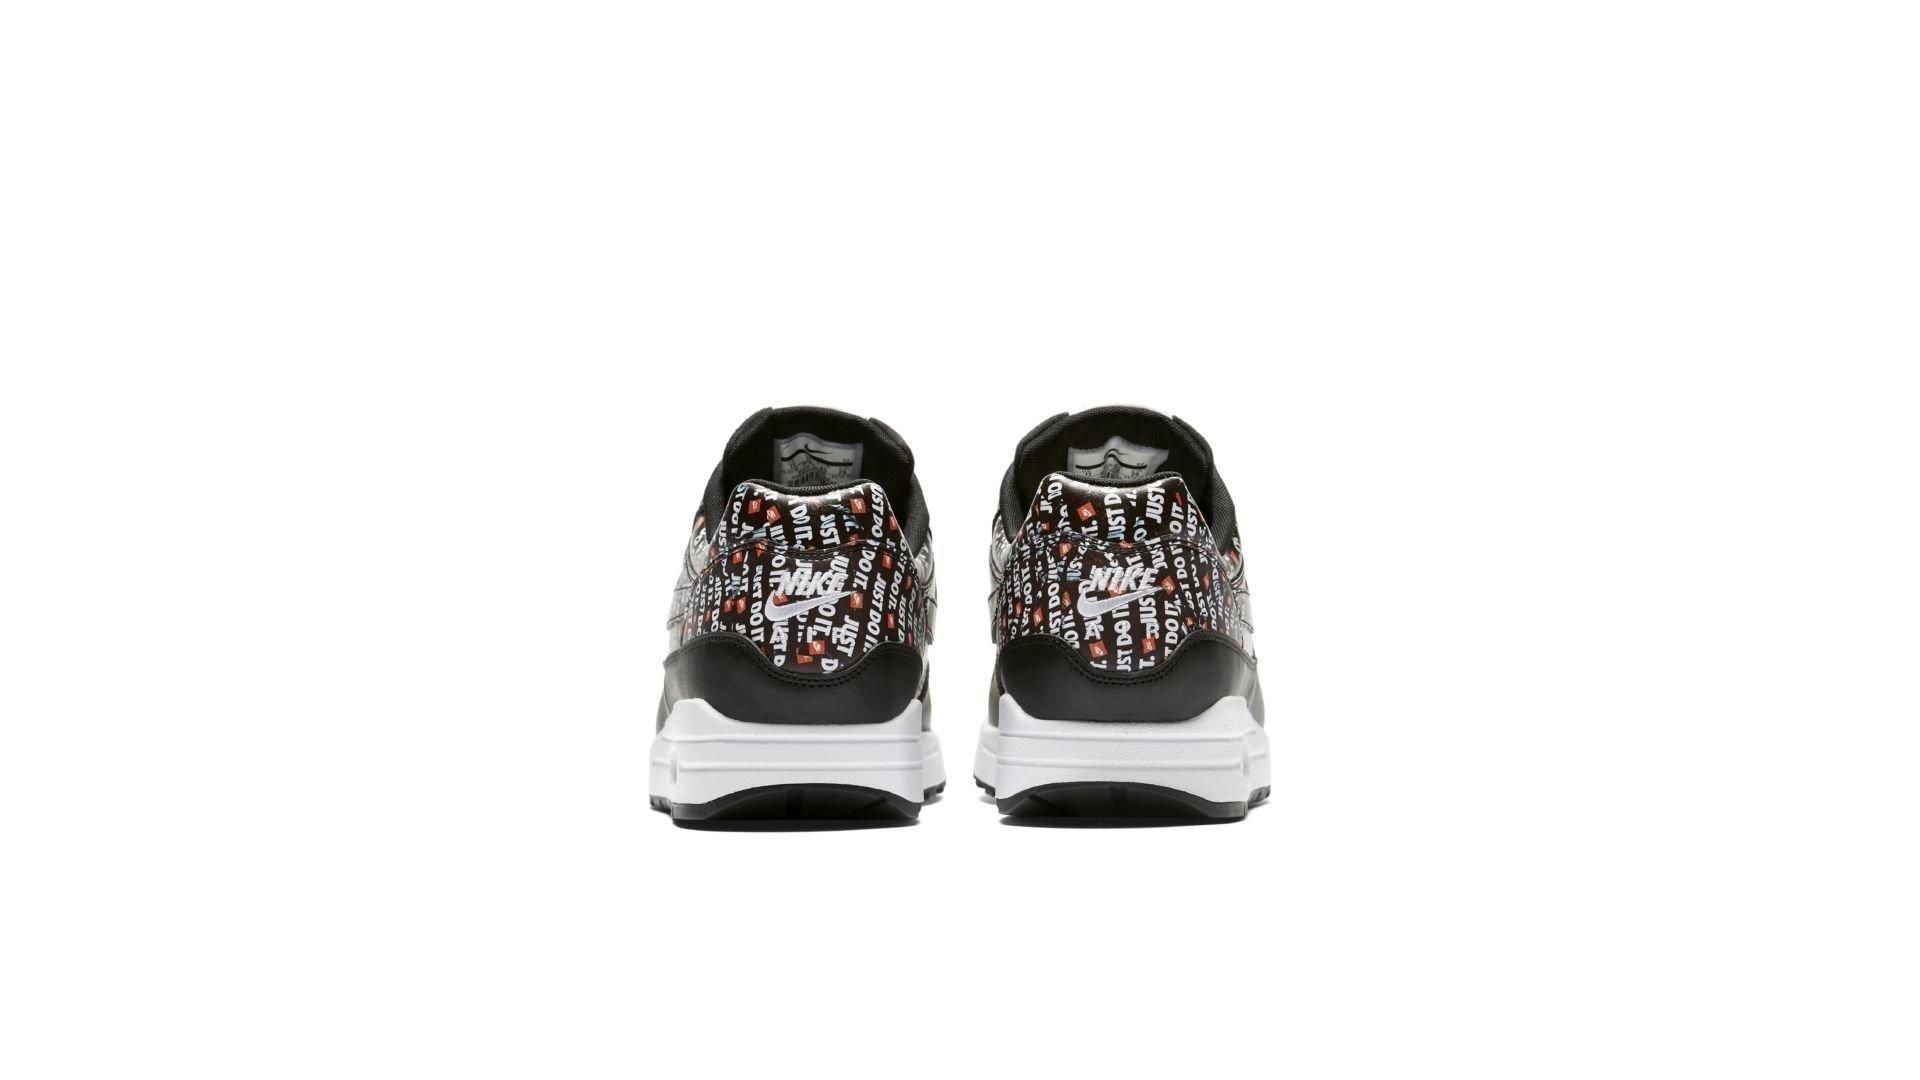 Nike Air Max 1 'Just Do It' Black (875844-009)